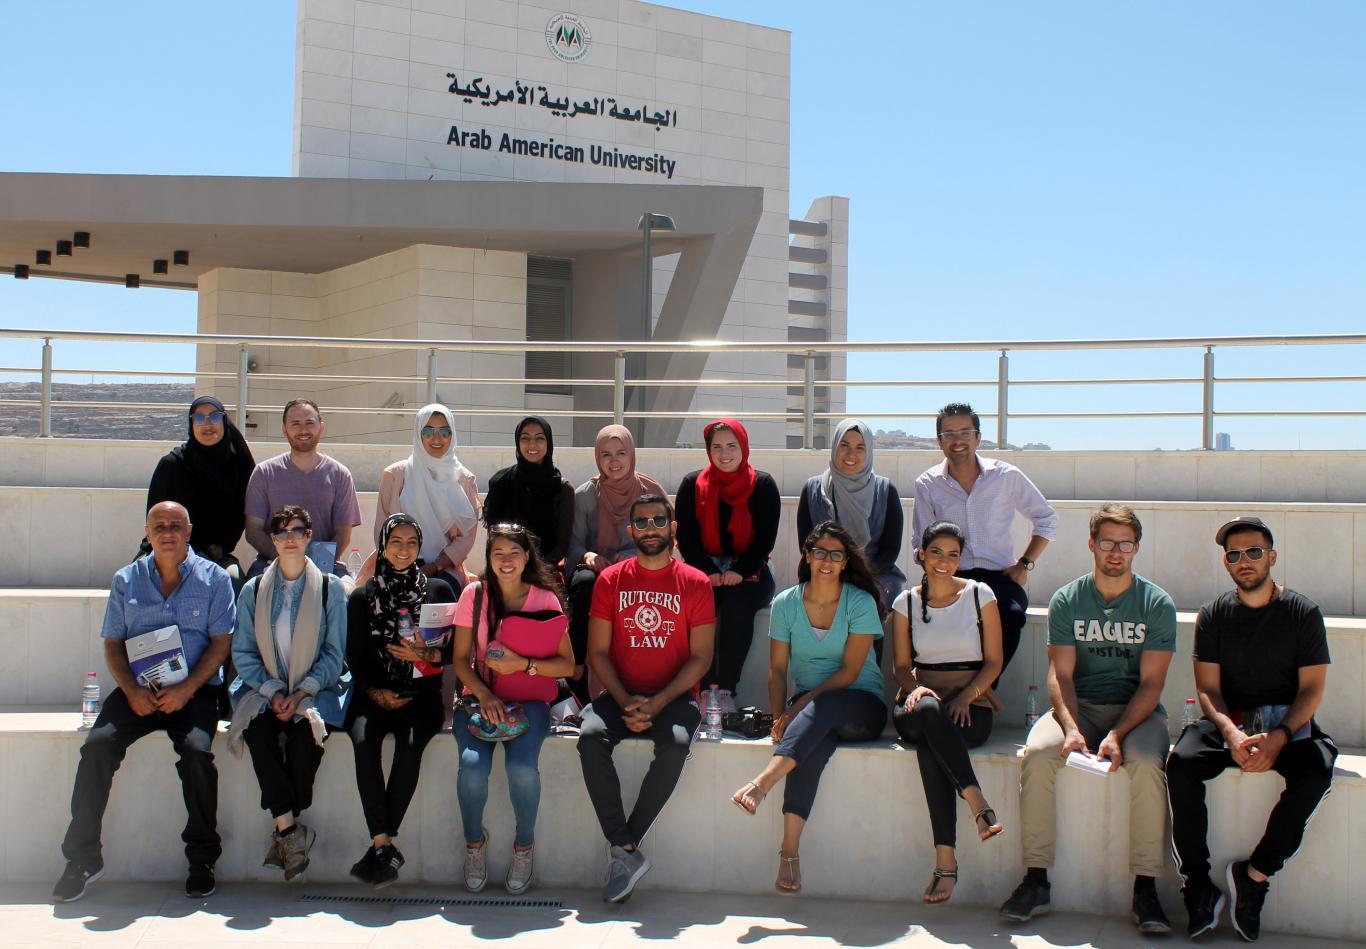 Arab American University Hosts Palestinian American Community Center Delegation in Ramallah